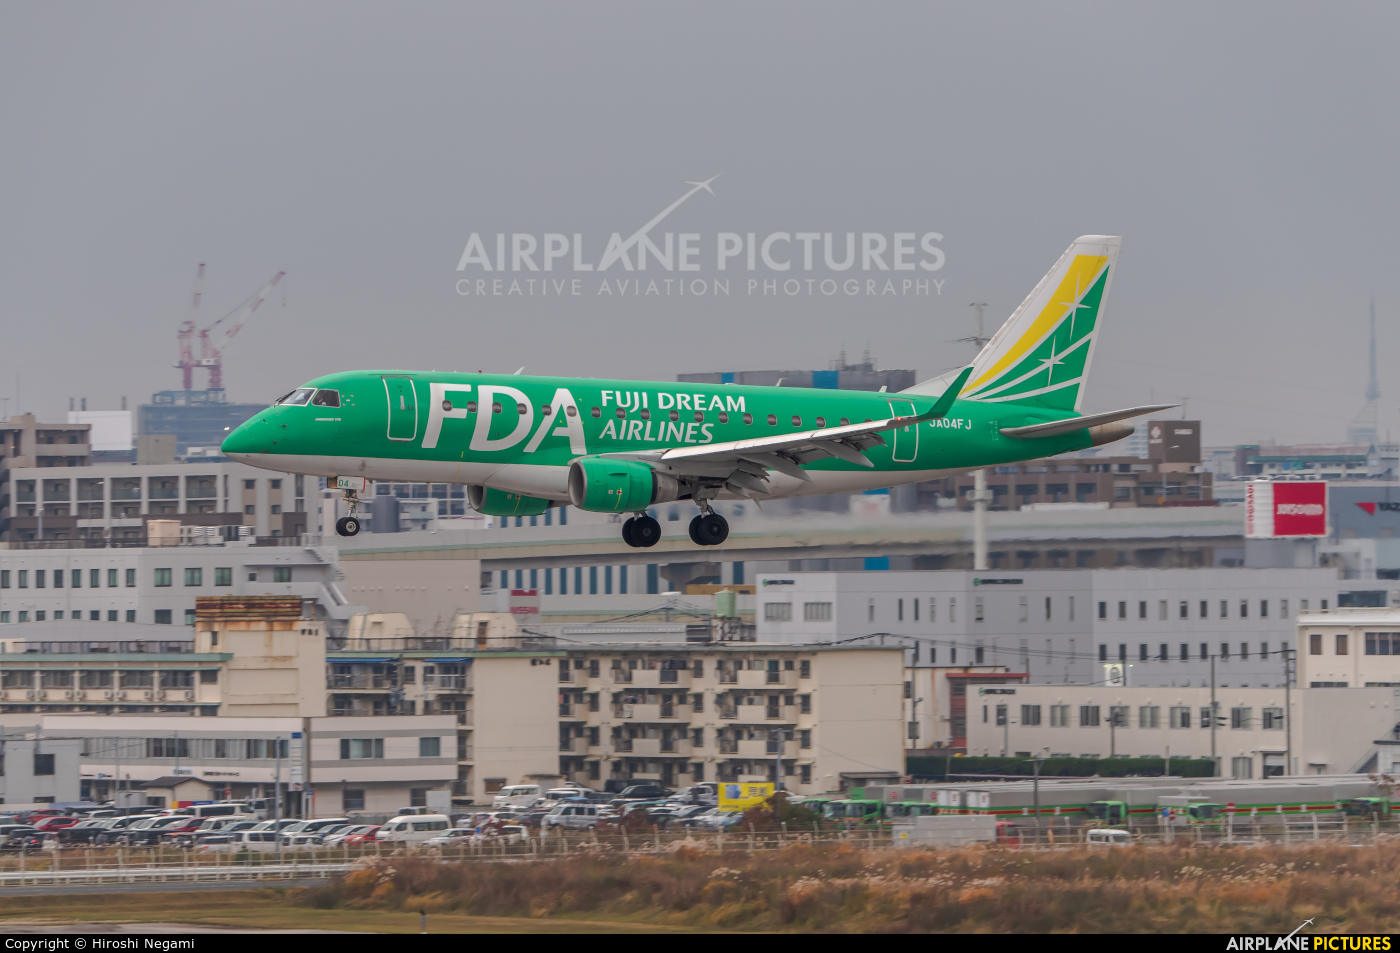 Fuji Dream Airlines JA04FJ aircraft at Fukuoka